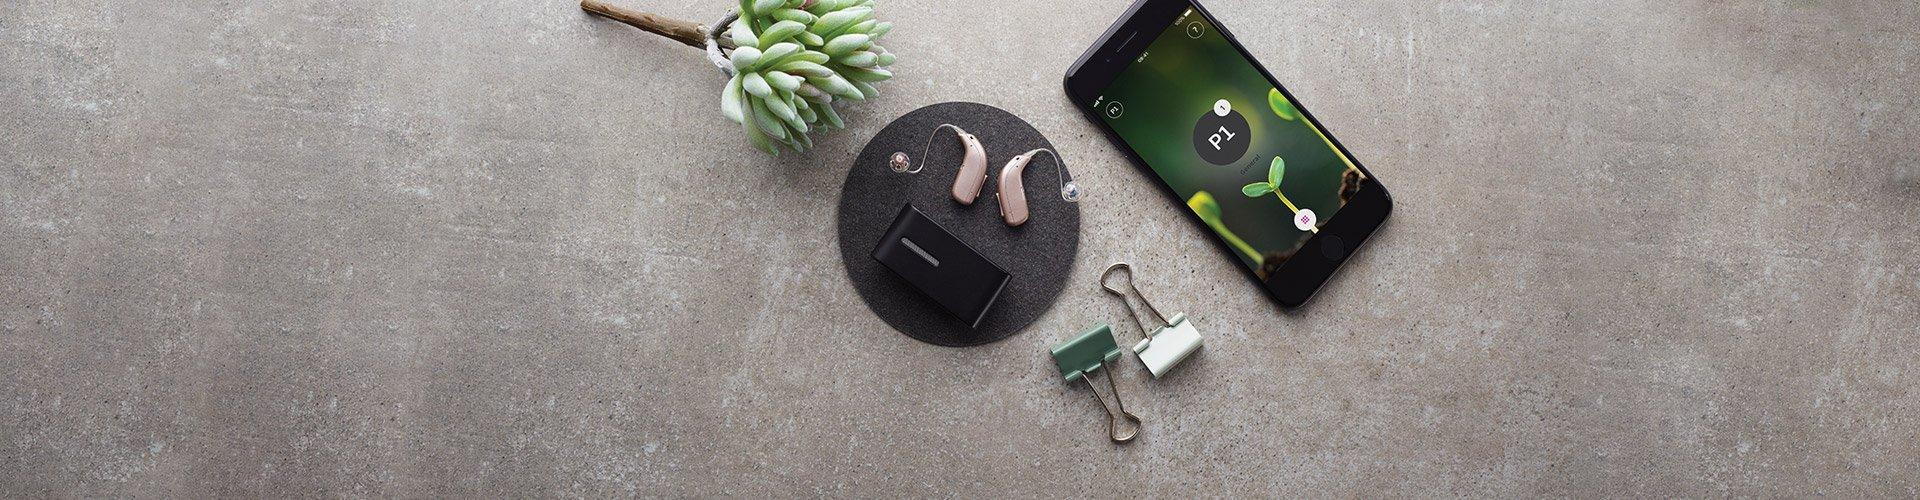 hearing-aid-accessories_slim